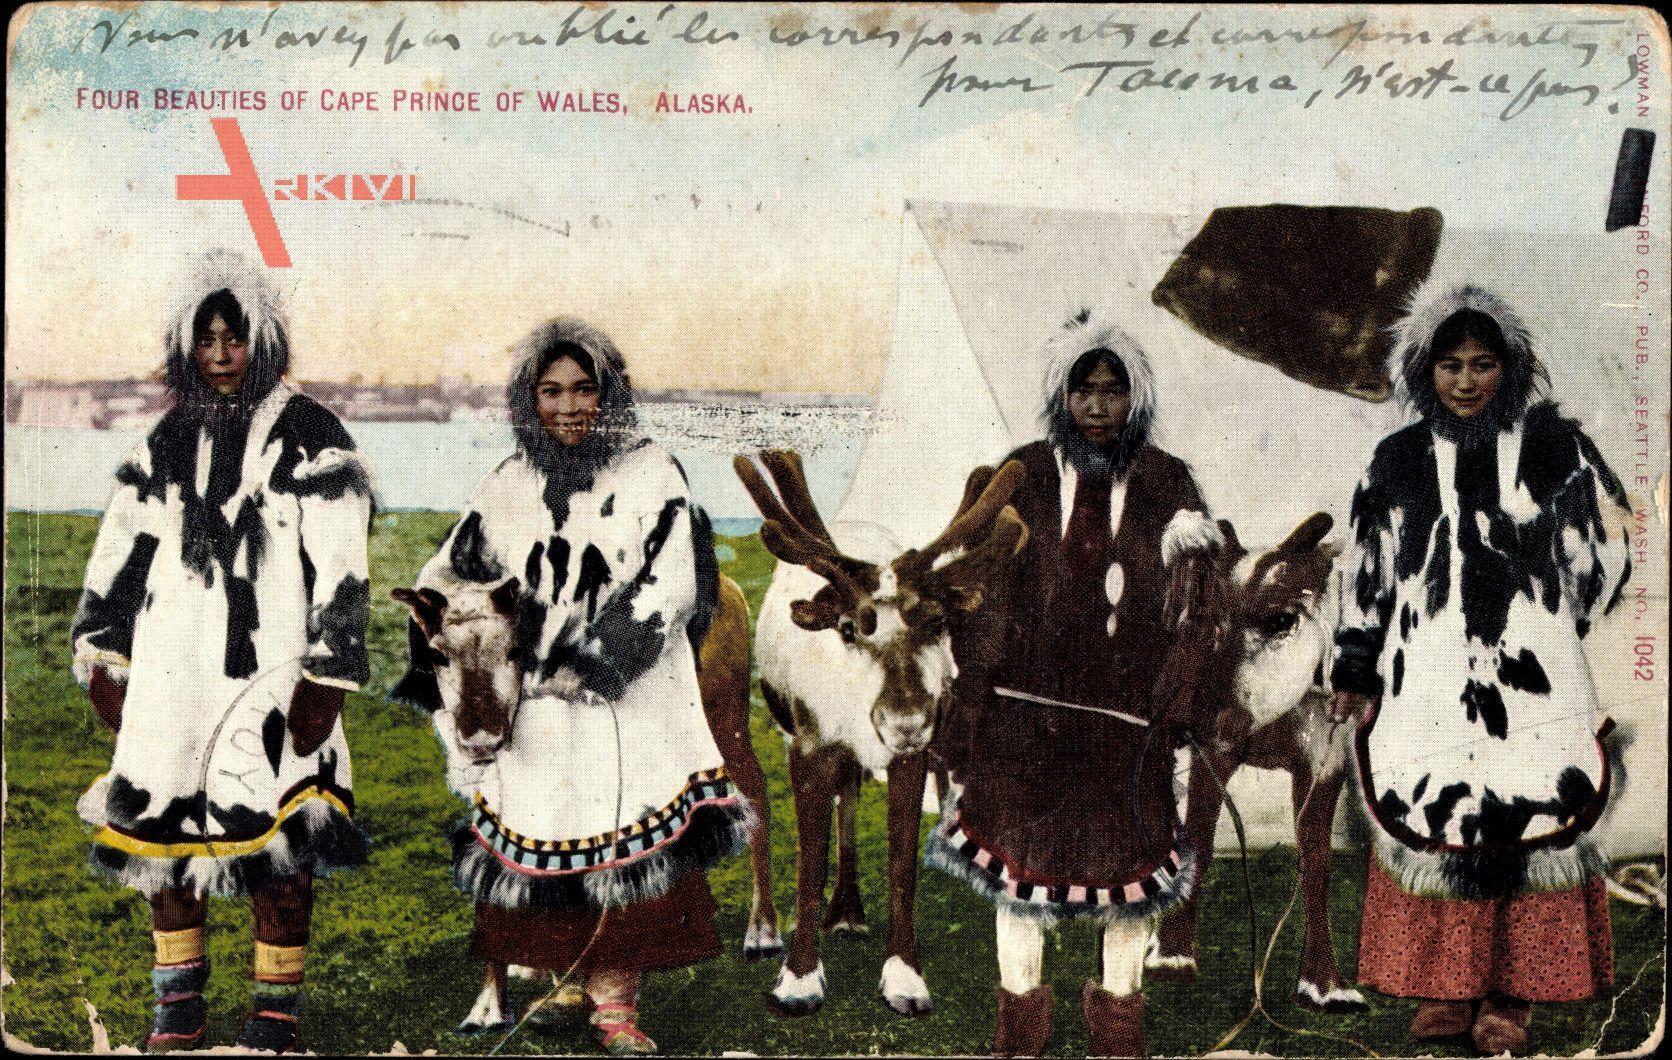 Alaska USA, Four beauties of Cape Prince of Wales, Eskimofrauen,Pelze,Rentier